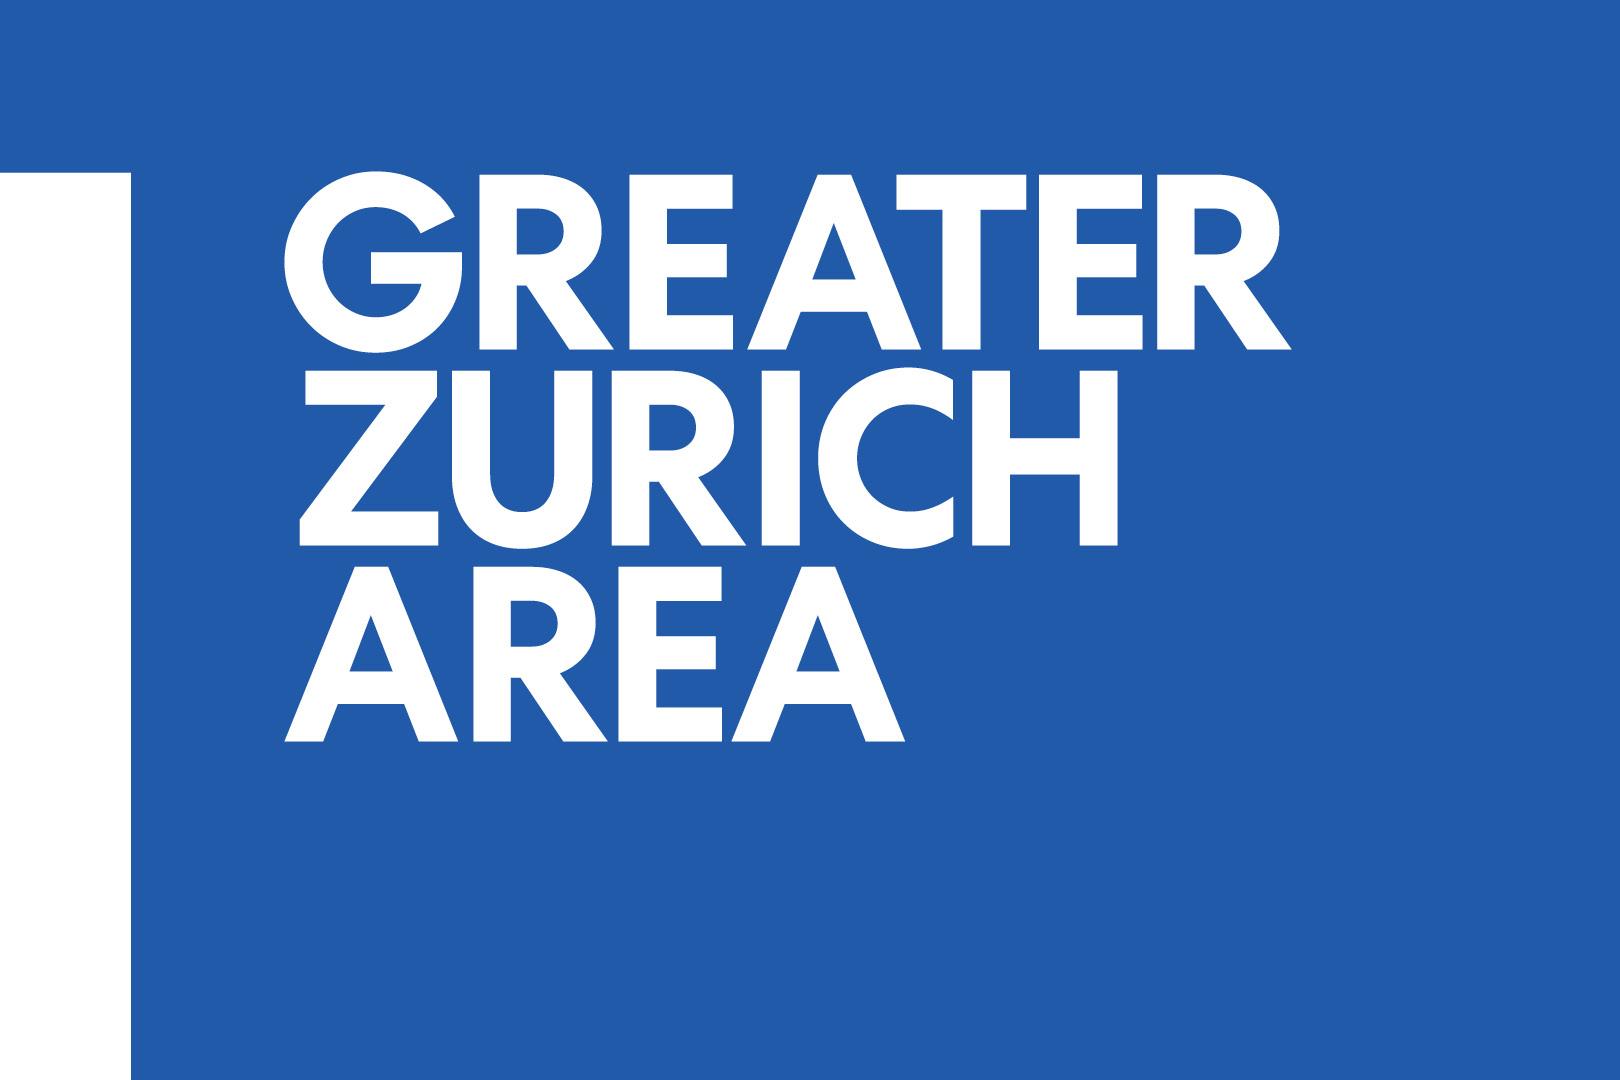 MetaDesign_Greater_Zurich_Area_Logo